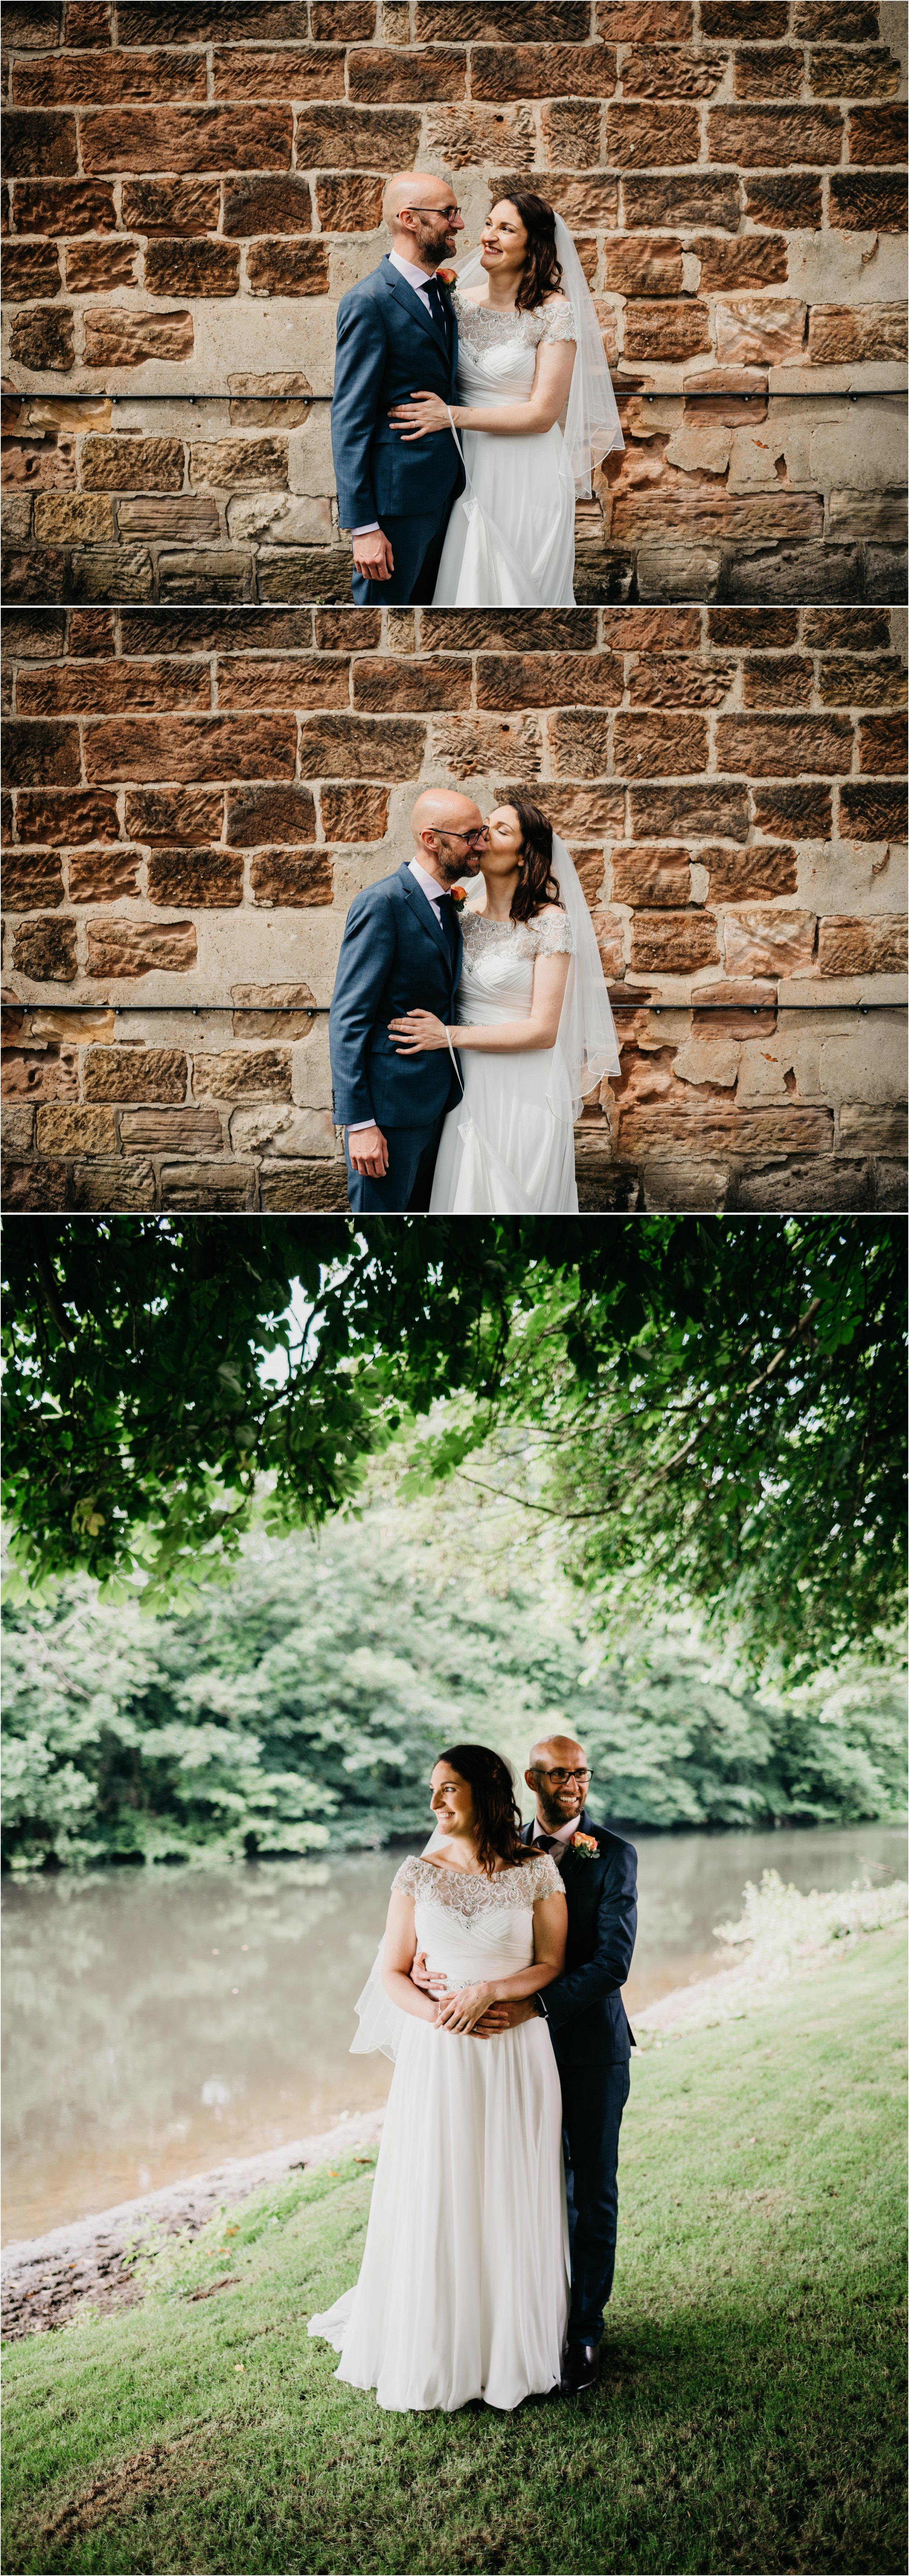 West Mill wedding photography_0046.jpg